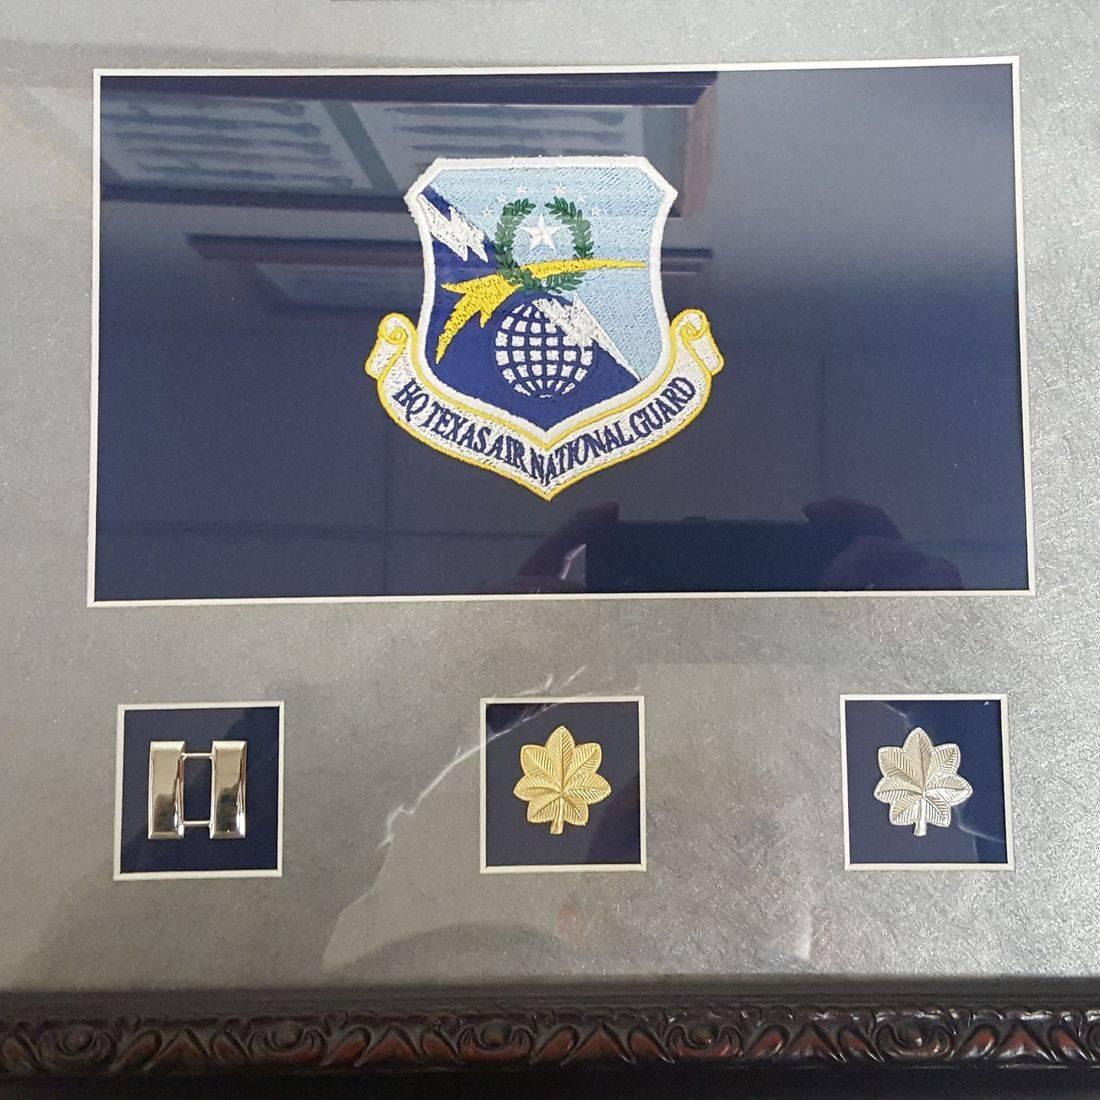 Headquarters Texas Air National Guard Award Embroidered Emblem